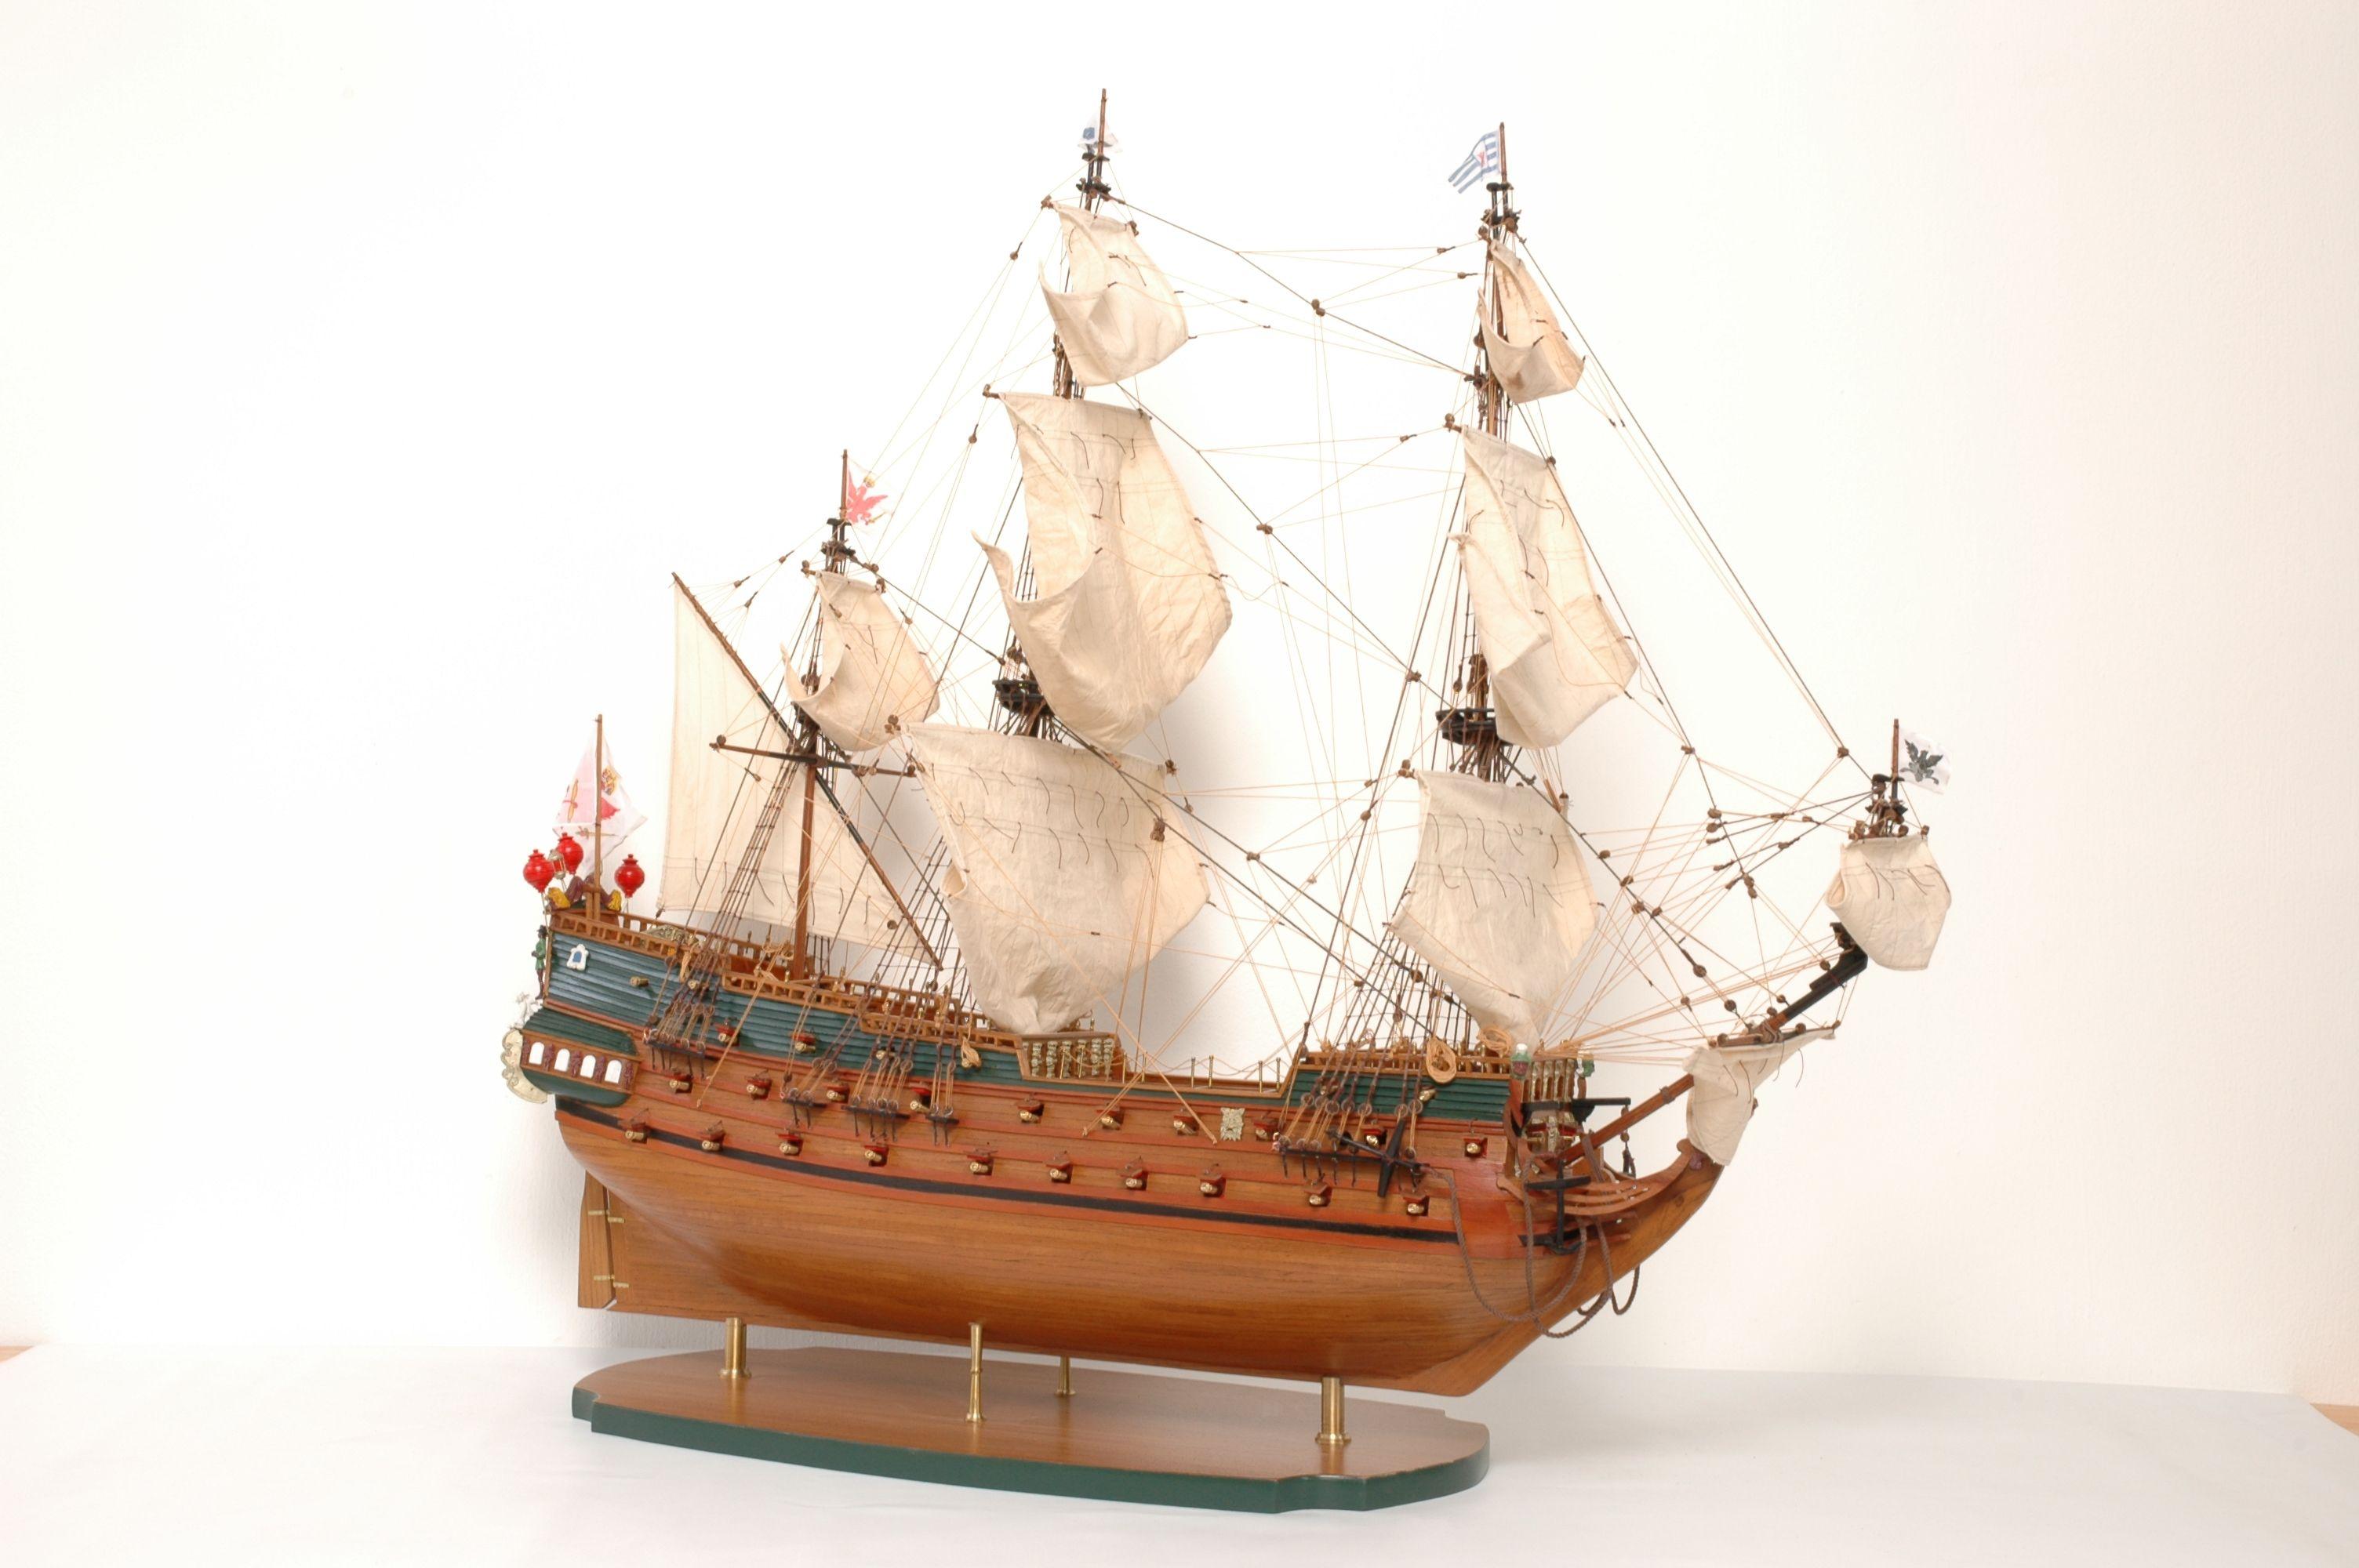 152-8209-Wappen-von-Hamburg-Ship-Model-Superior-Range